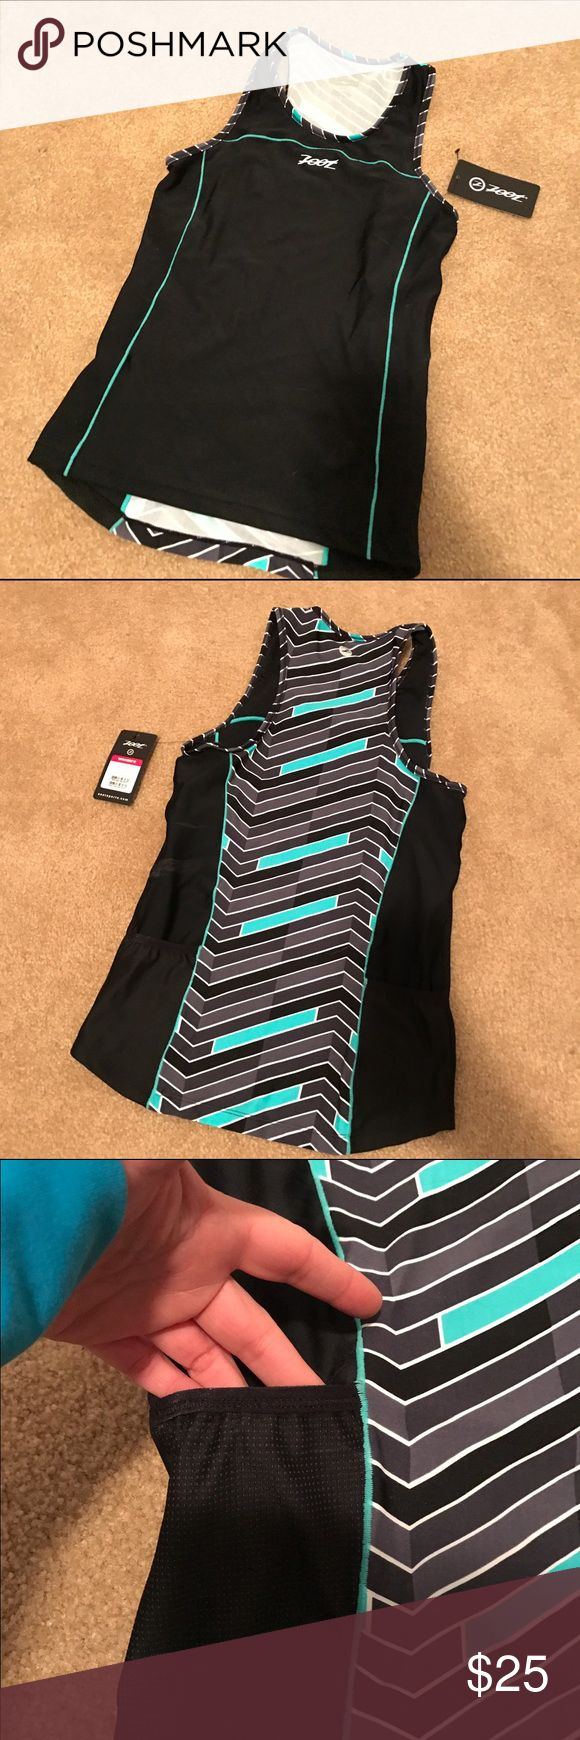 Zoot women's Triathlon performance tank Brand new with tags still on. Pockets on side. It fits snug. Zoot Tops Tank Tops